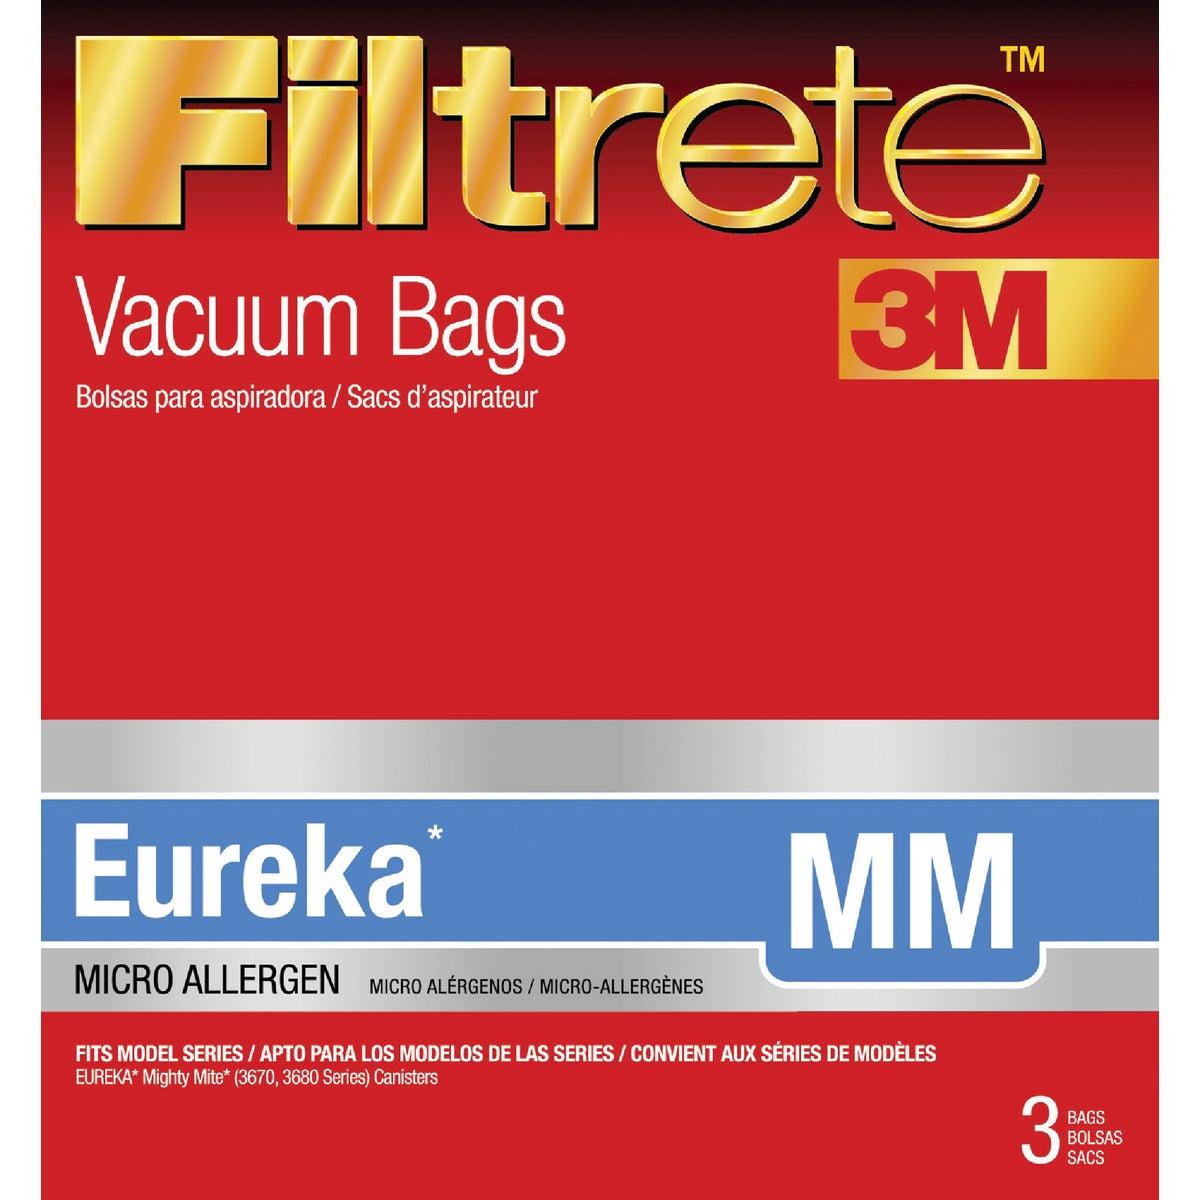 3M Filtrete Eureka Type MM Micro Allergen Vacuum Bag (3-Pack)